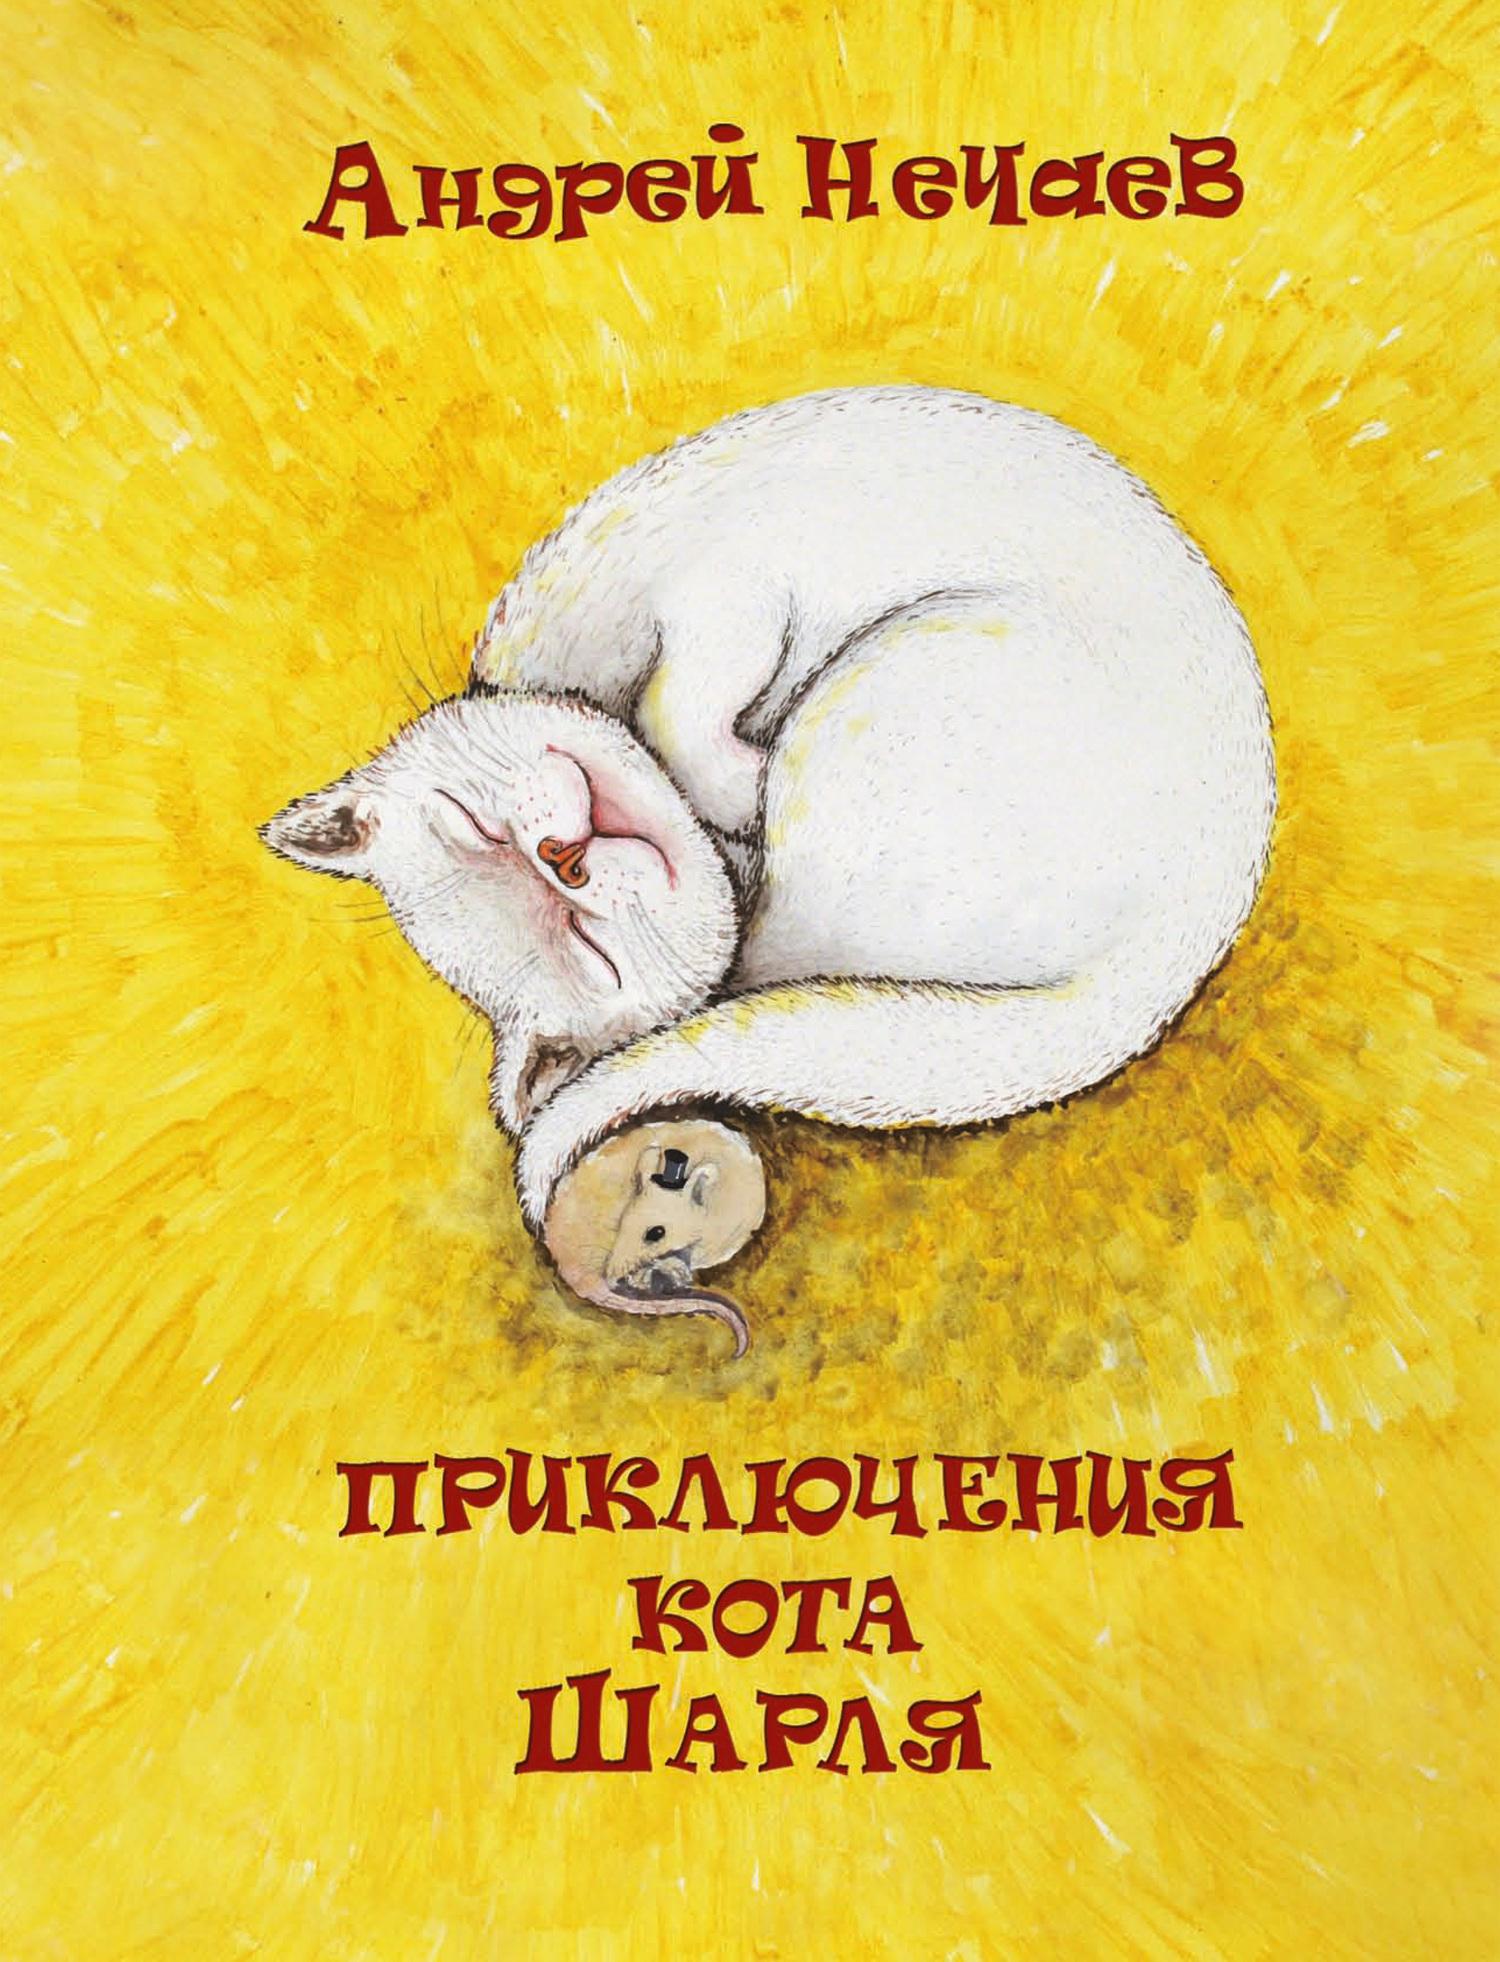 Андрей Нечаев. Приключения кота Шарля